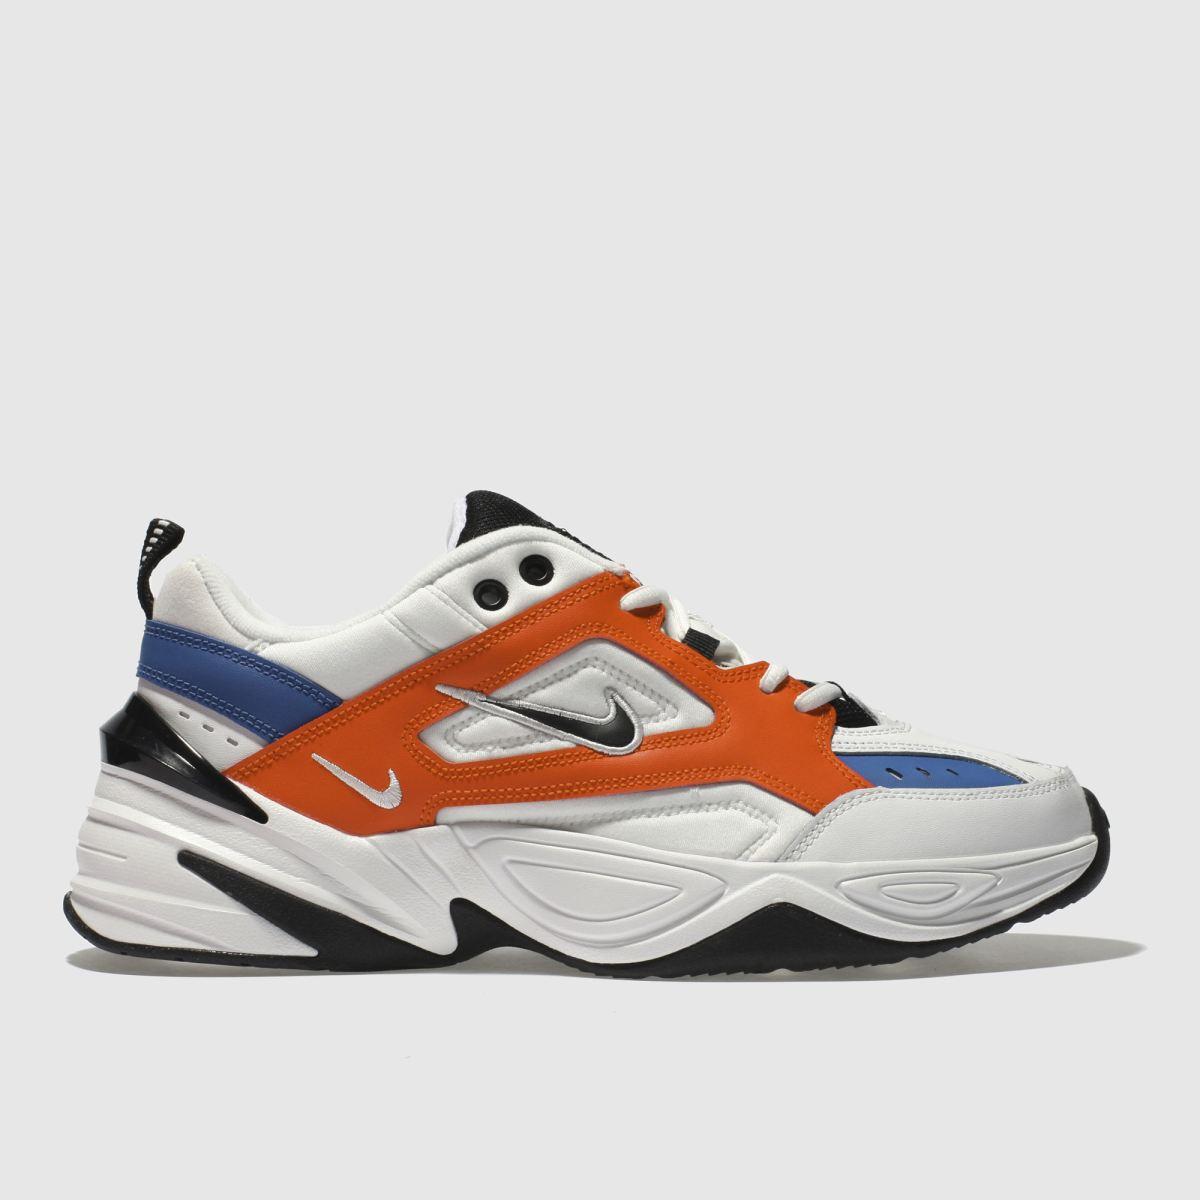 Nike White & Orange M2k Tekno Trainers